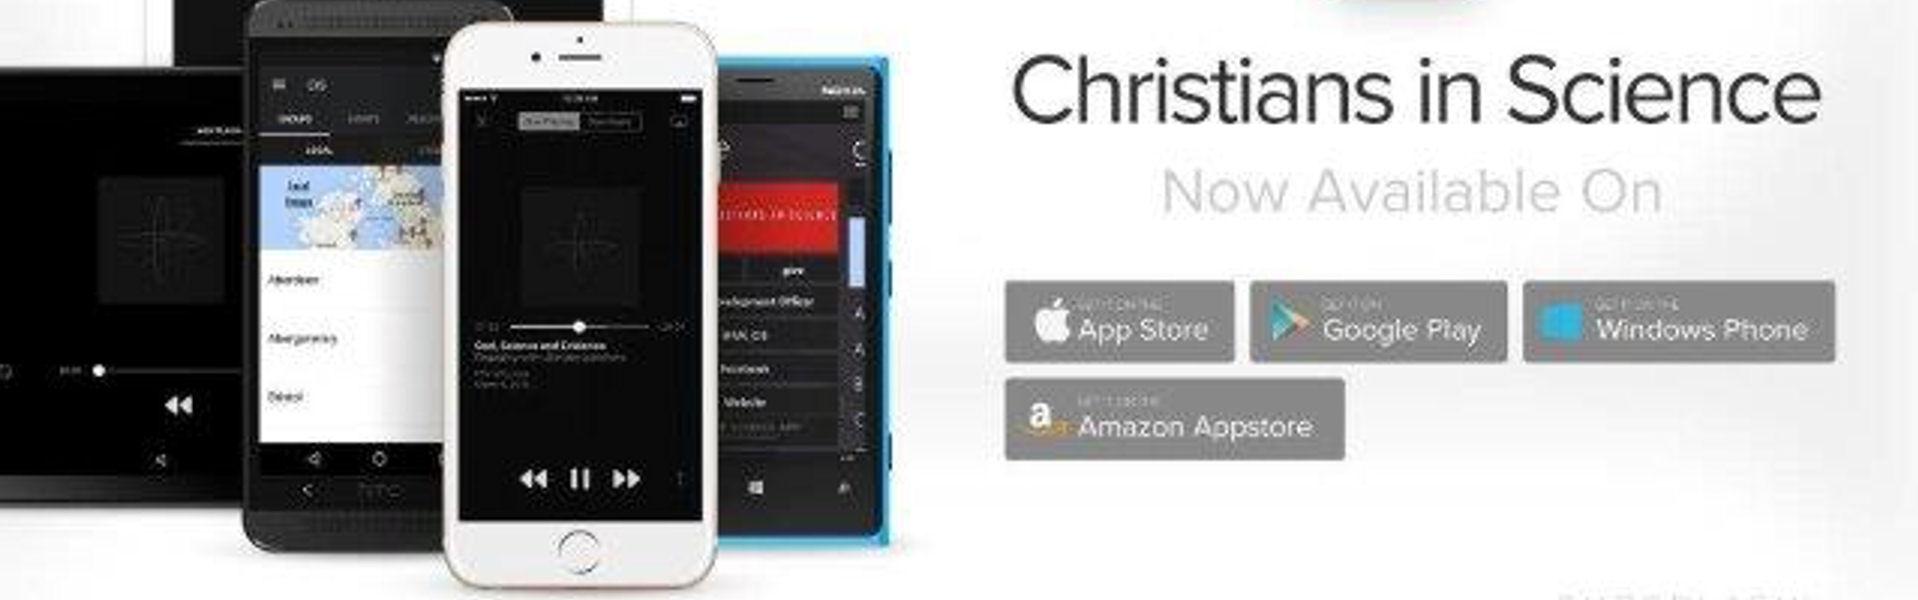 app-slide-feature-smaller